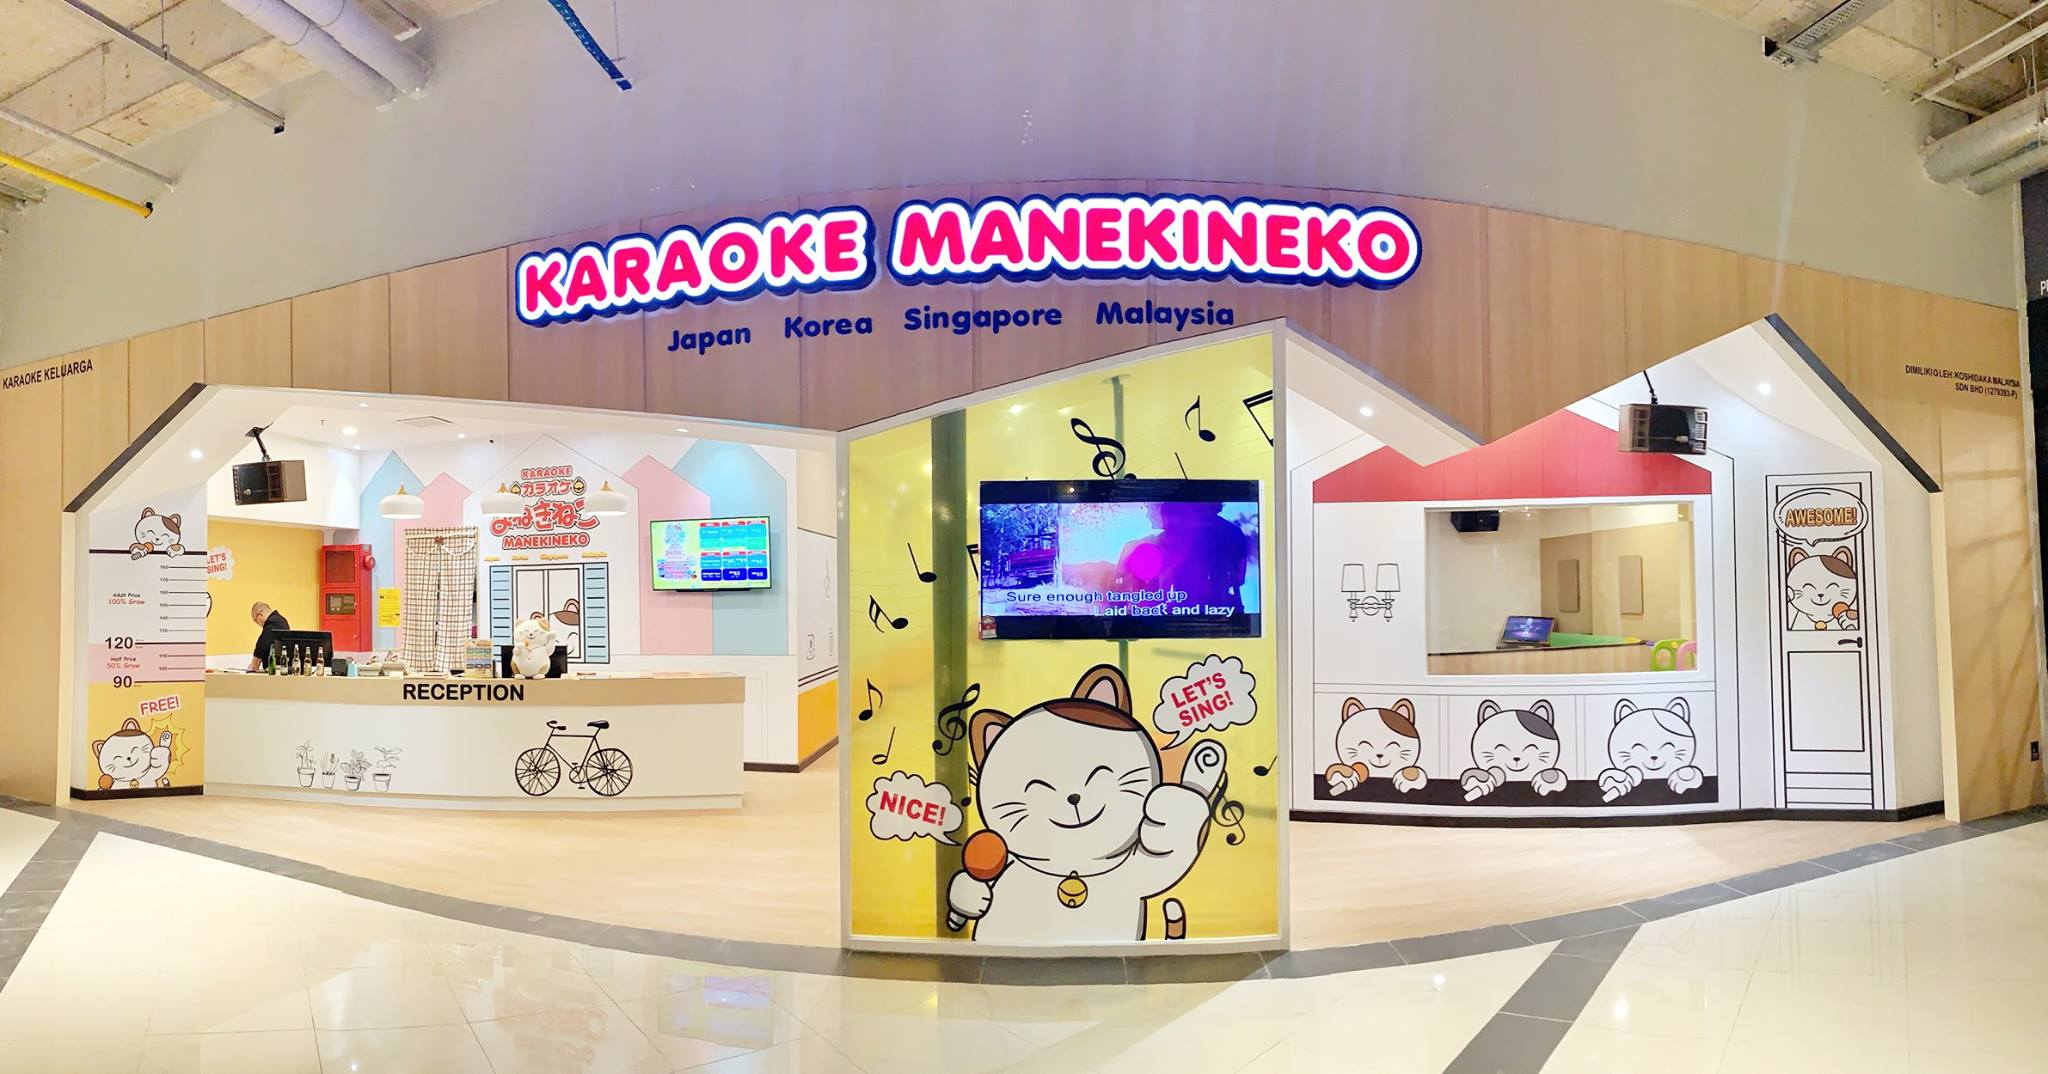 Image from Karaoke Manekineko Malaysia Facebook